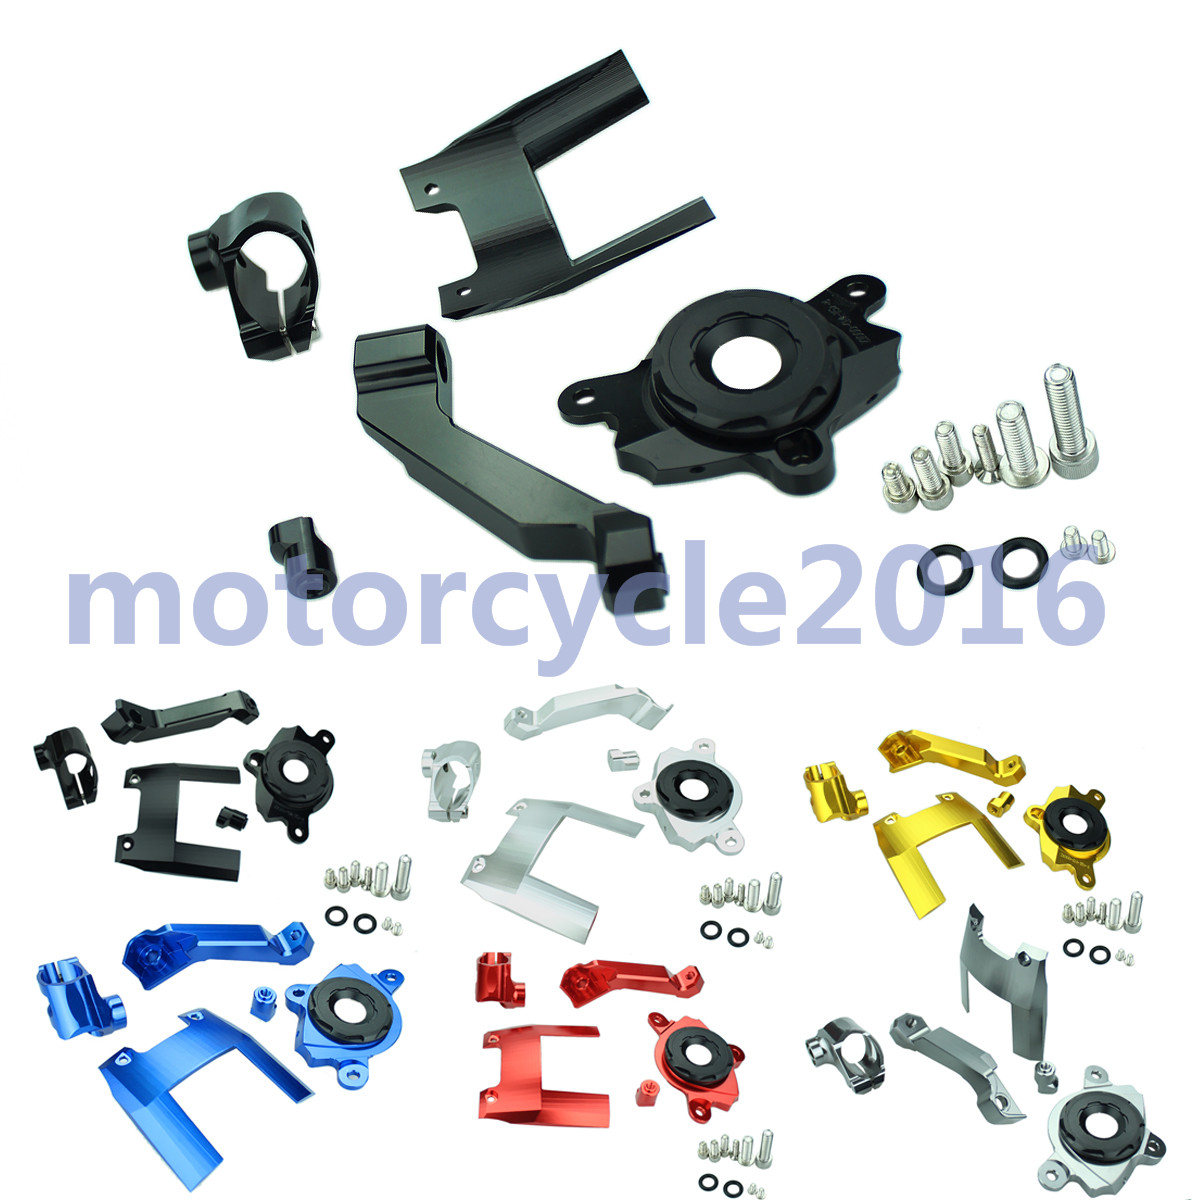 ФОТО Adjustable Steering Stabilize Damper bracket Mount kit For Kawasaki Z1000 2016-2017  T6061-T6 Aluminum One set CNC FXCNC